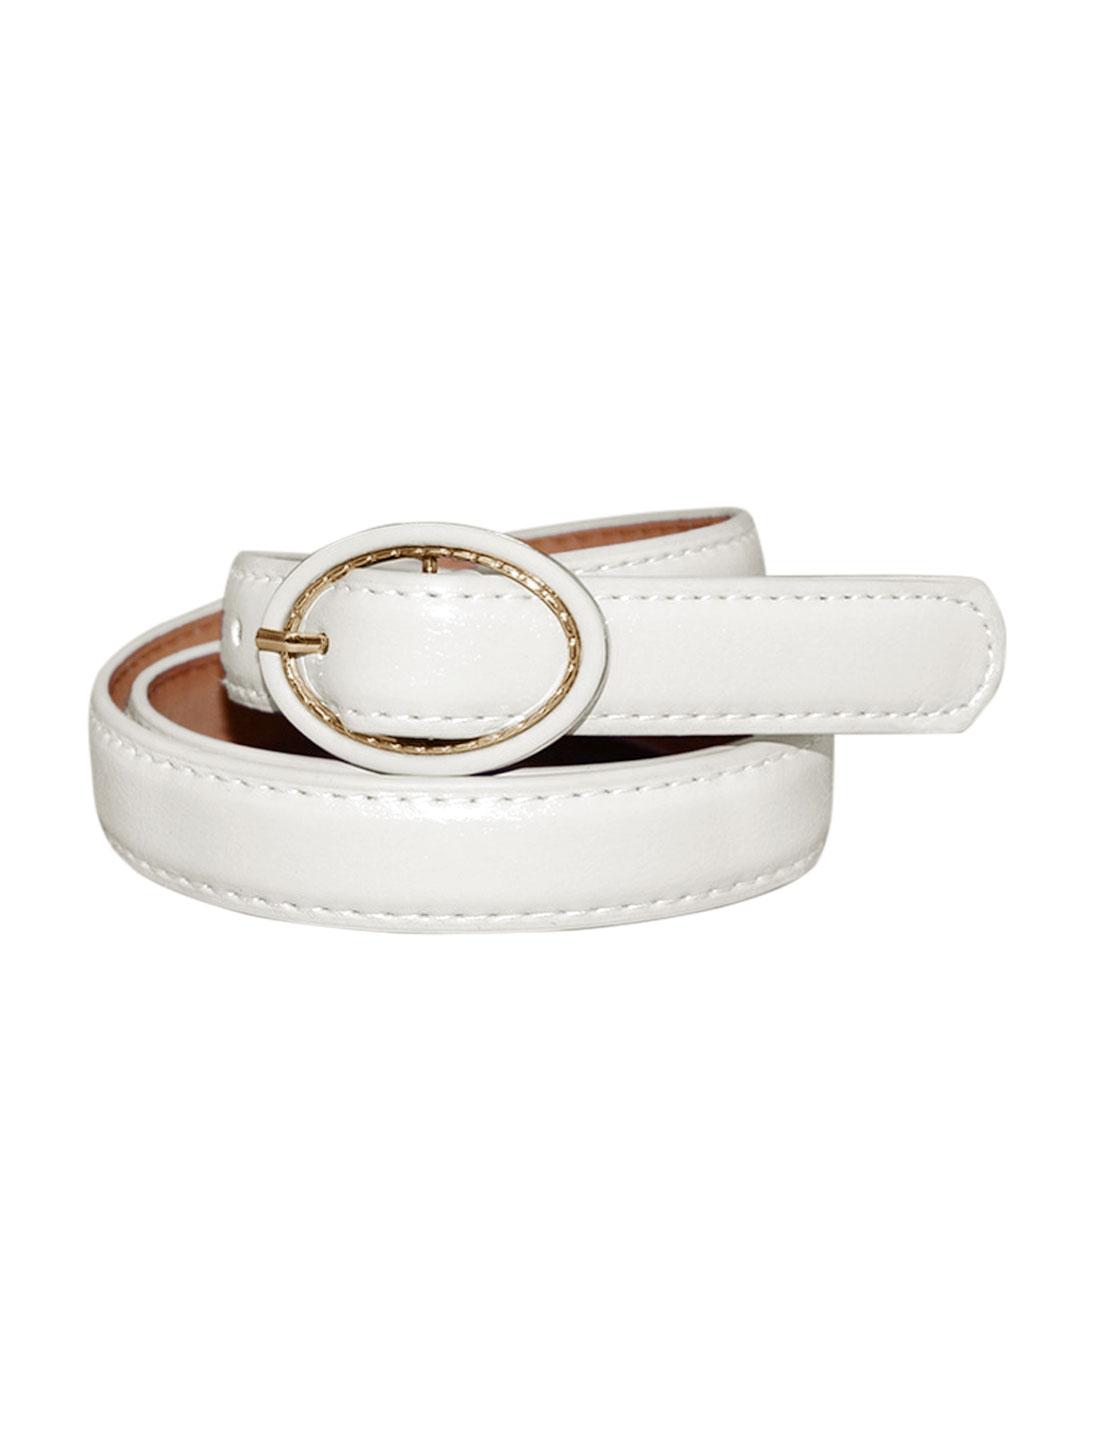 Women Single Pin Buckle Circle Design Adjustable PU Belt White